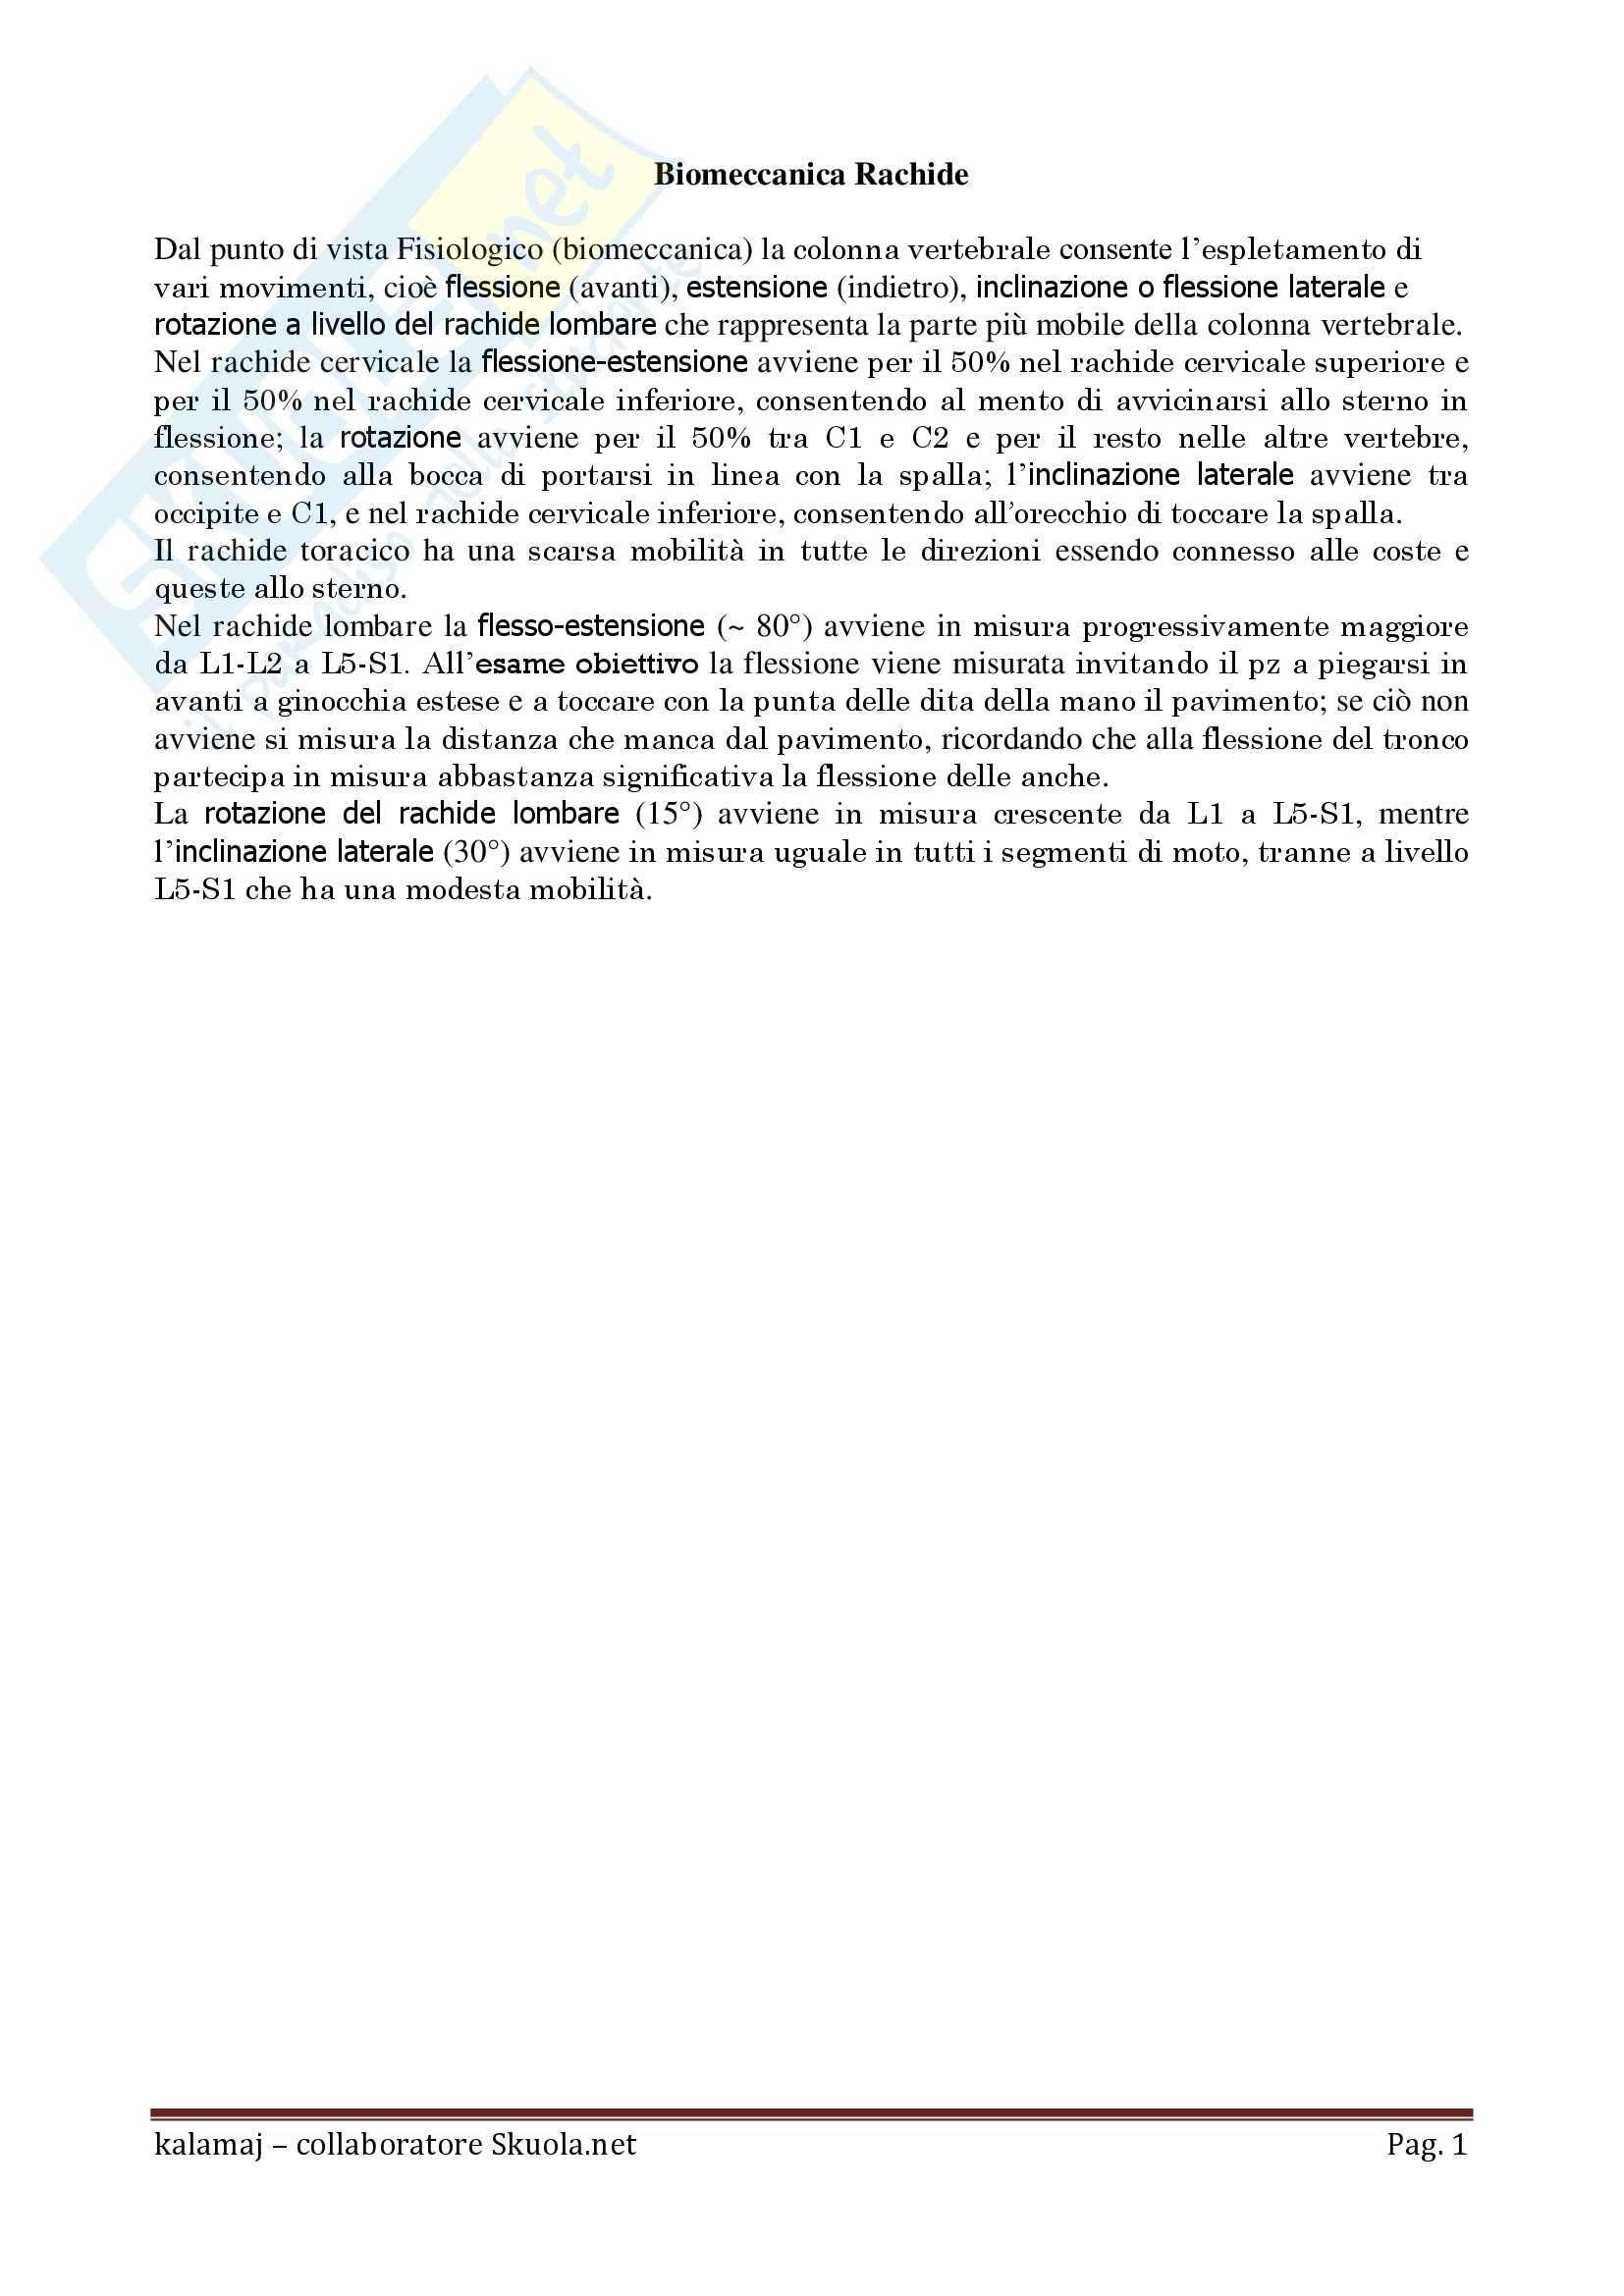 Anatomia umana - Biomeccanica Rachide